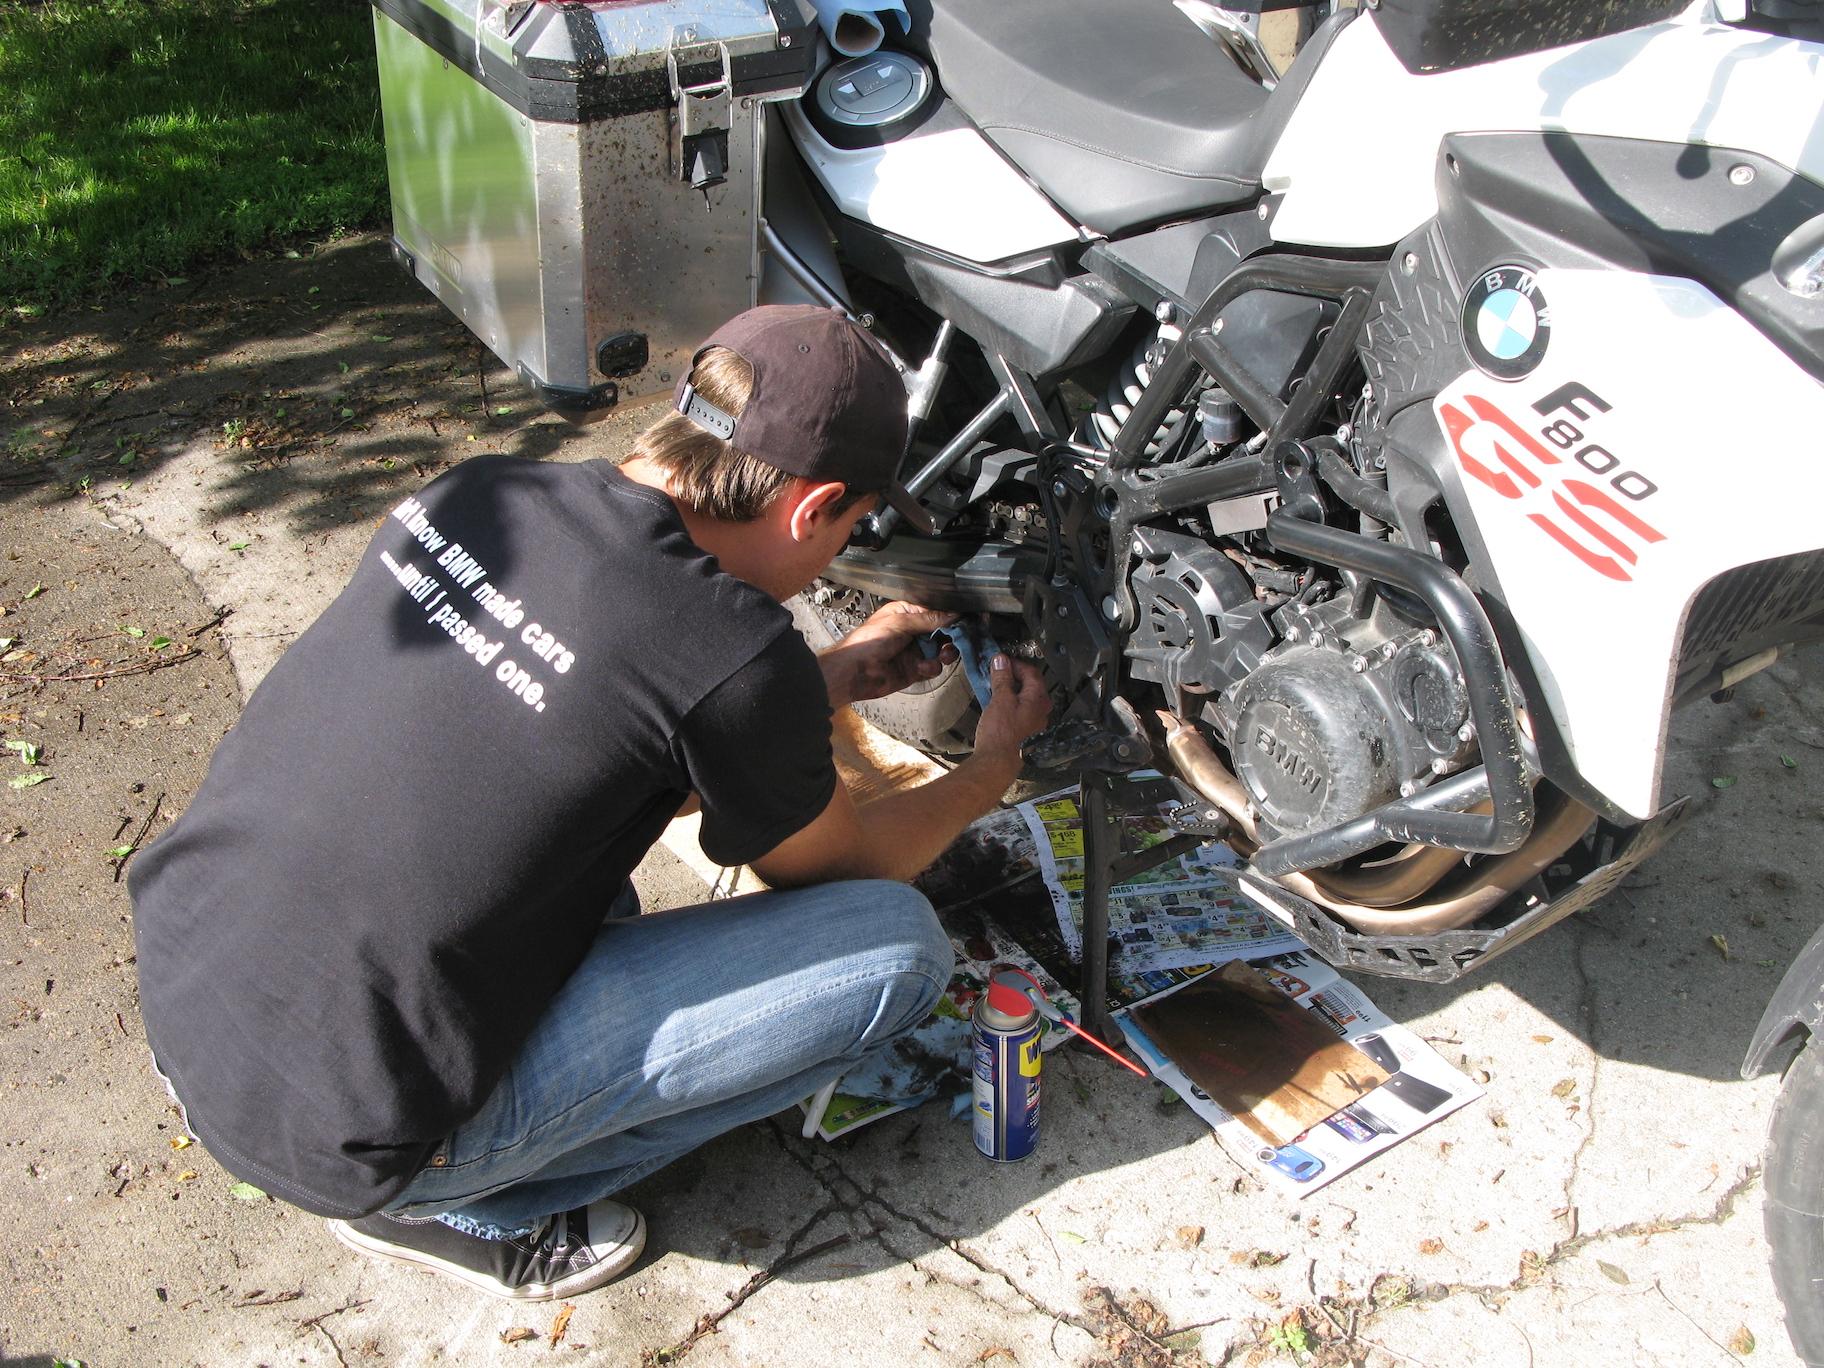 Building a bike